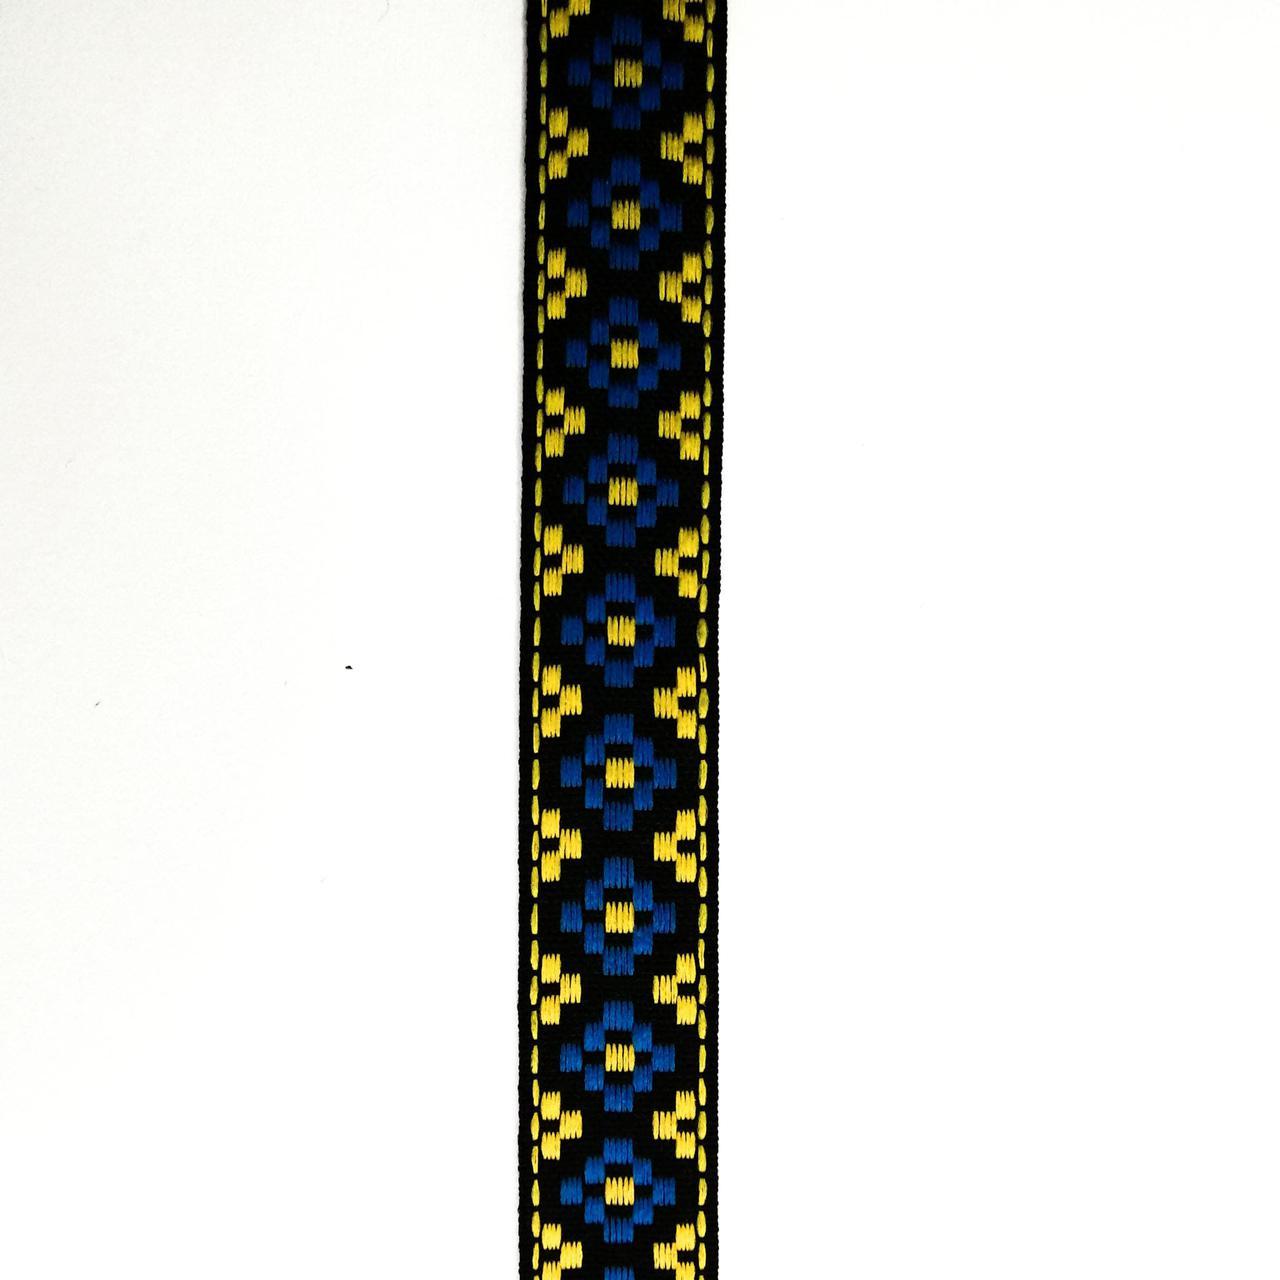 Лента отделочная с украинским орнаментом 17 мм (25м/рулон)